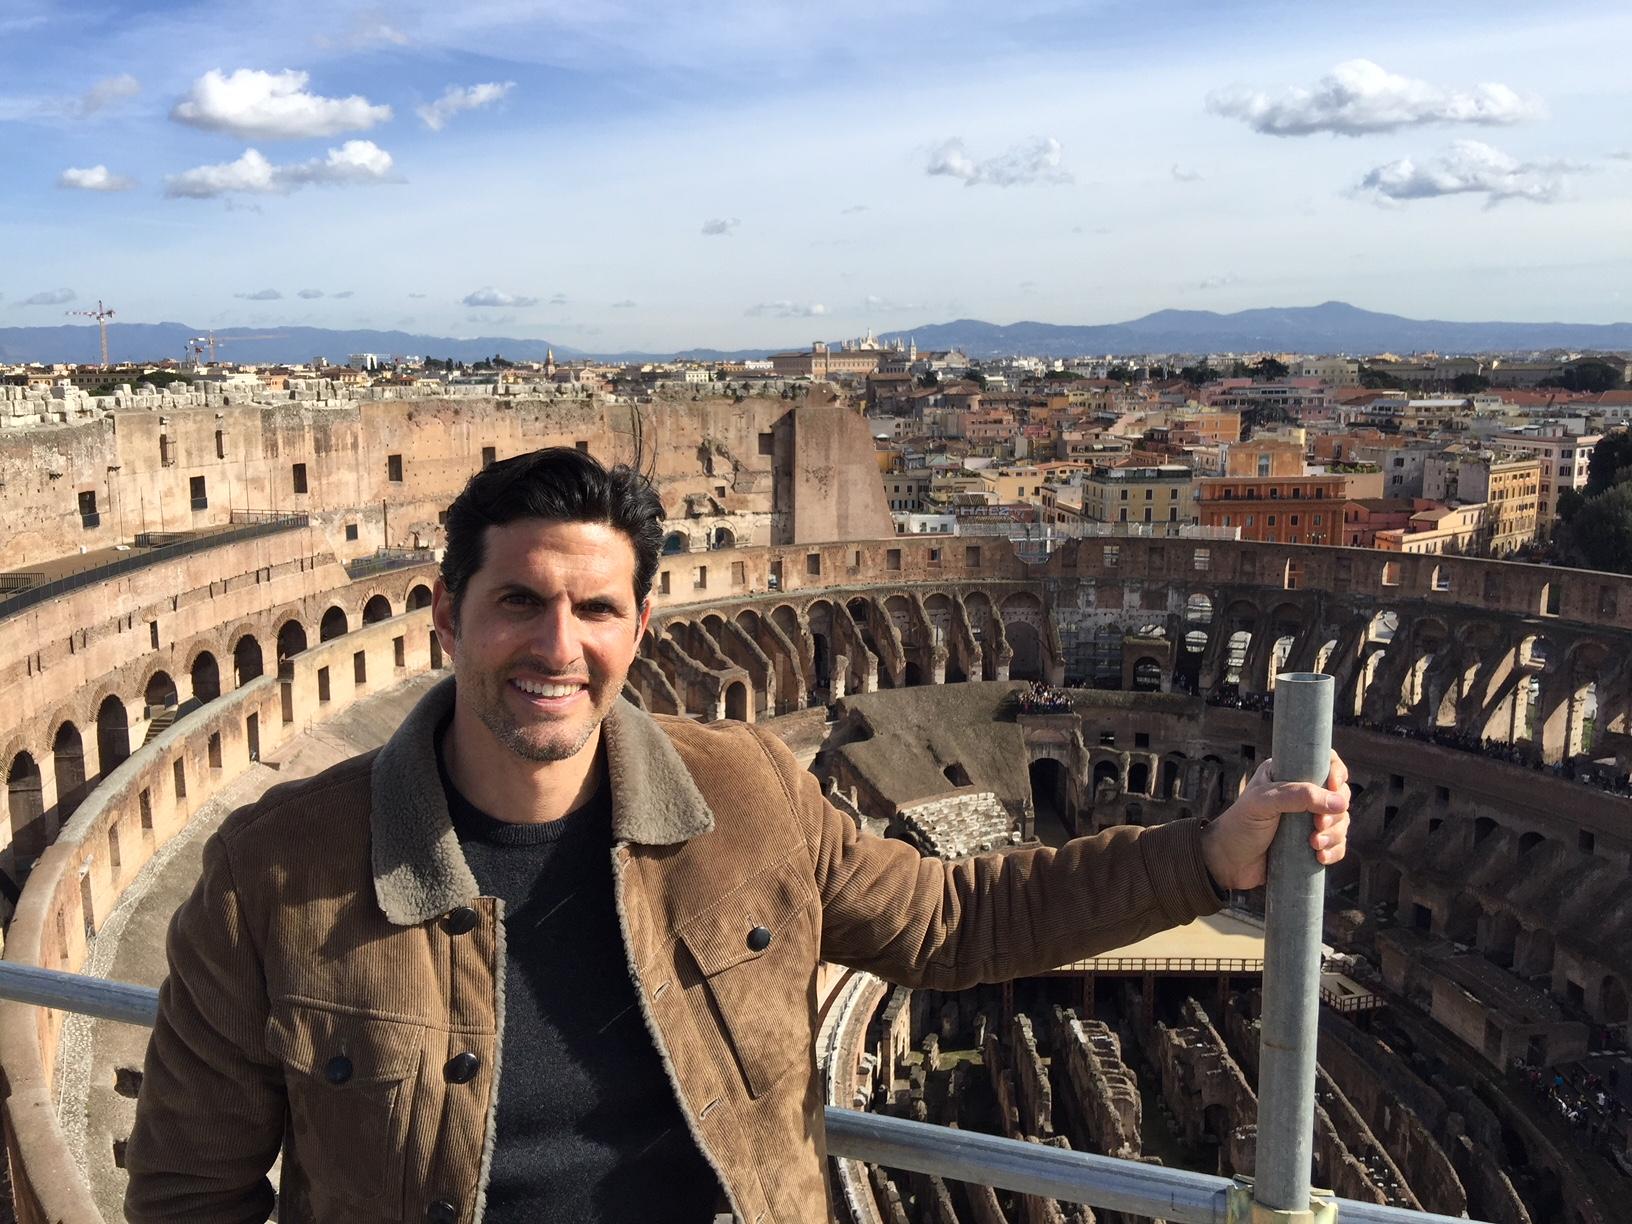 Rome heritage preservation